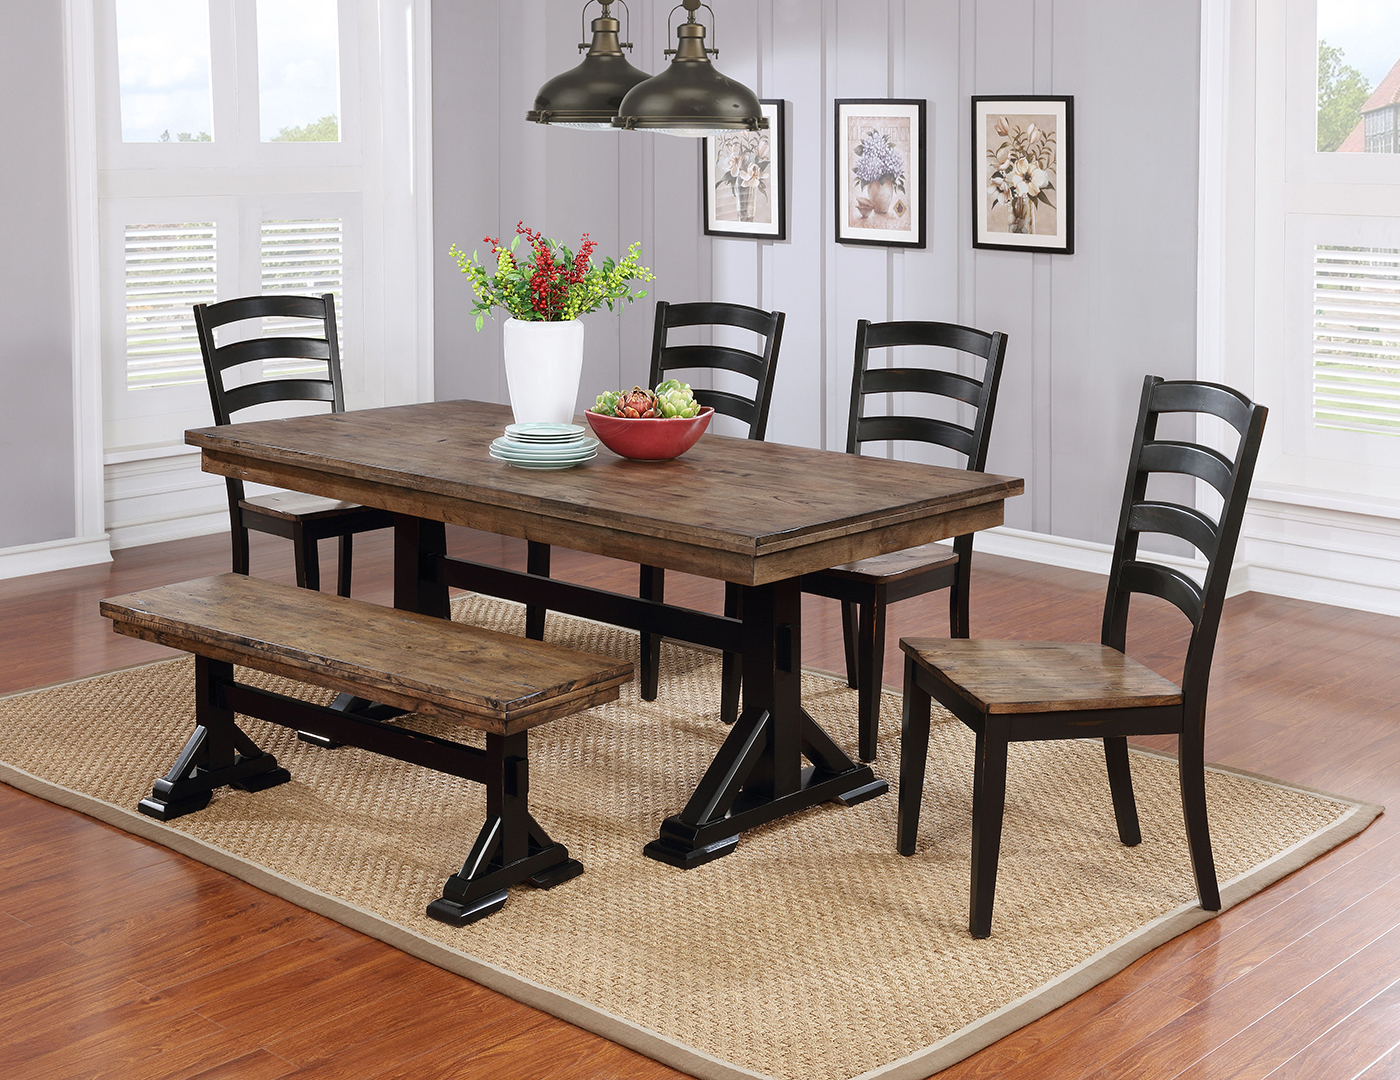 100 dining room clearance 100 dining room clearance chair